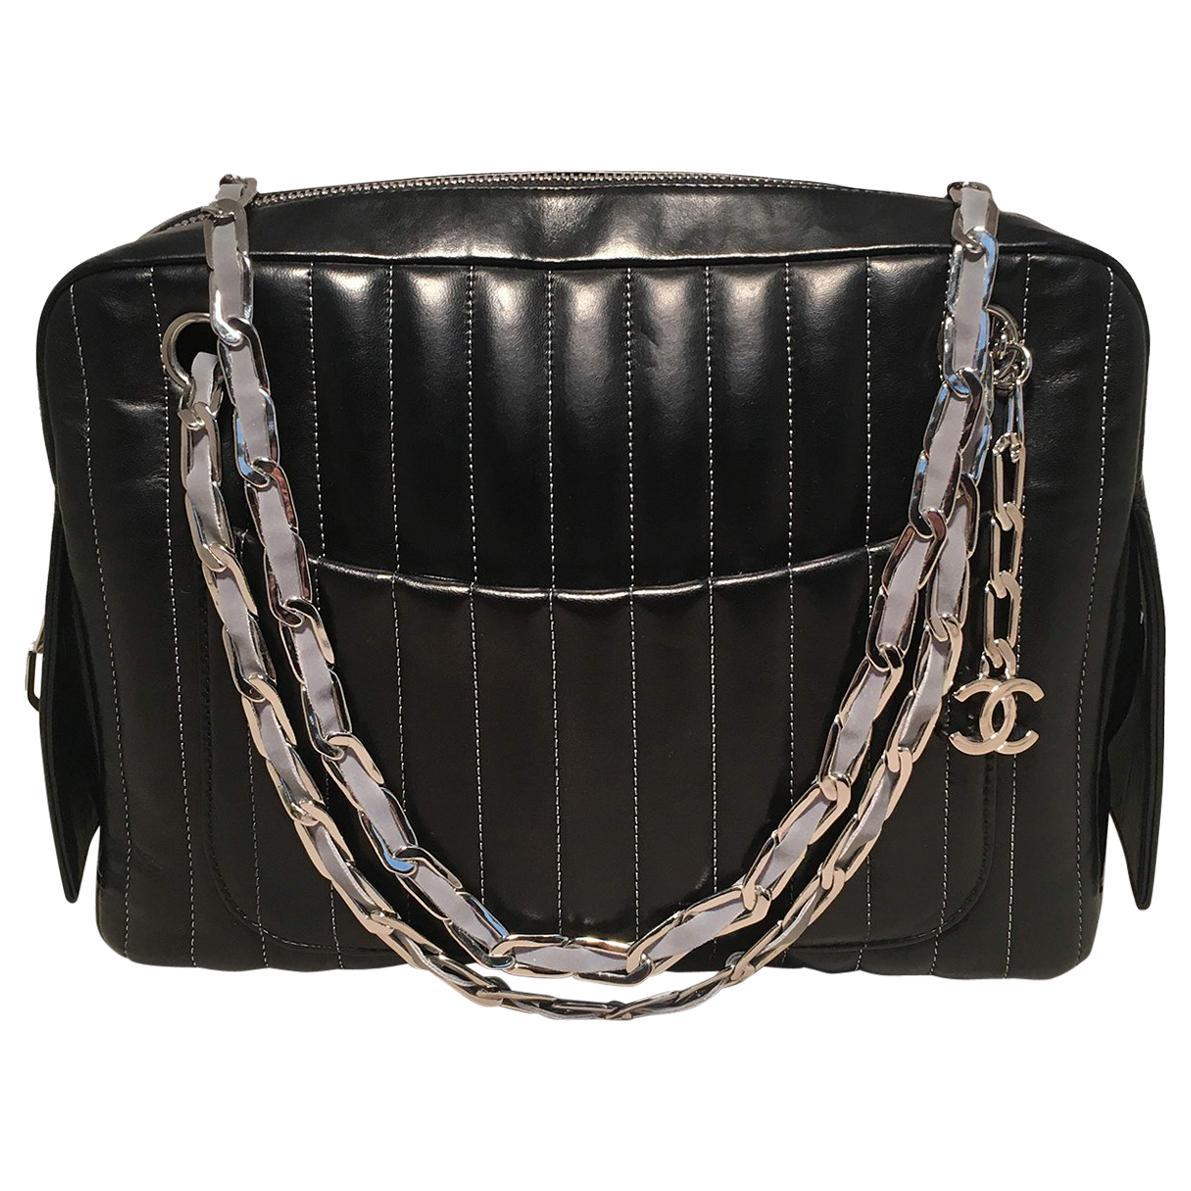 Chanel Mademoiselle Ligne Vertical Quilted Black Leather Camera Bag